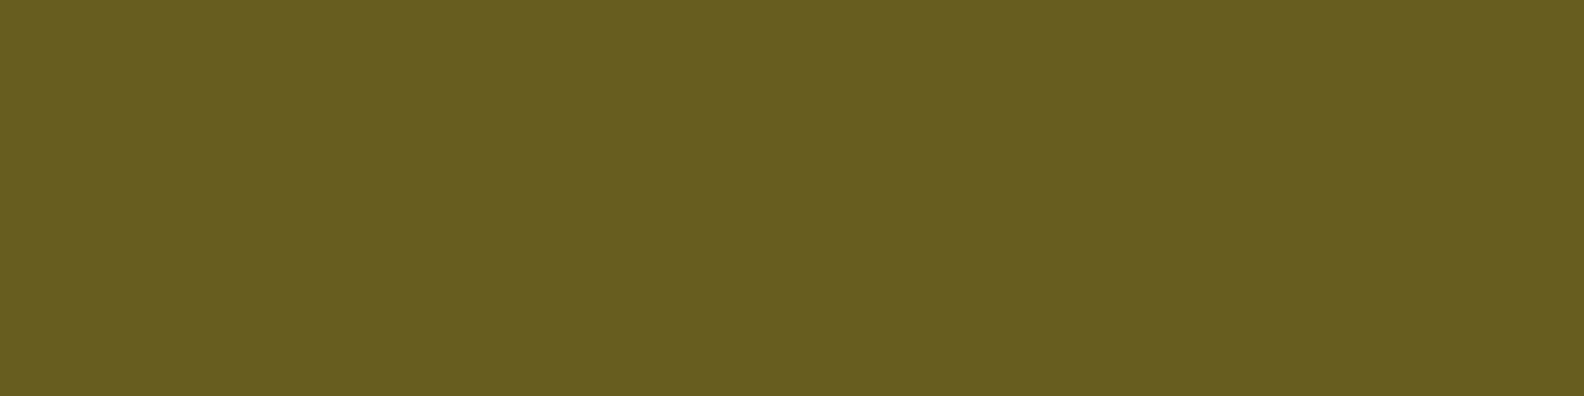 1584x396 Antique Bronze Solid Color Background